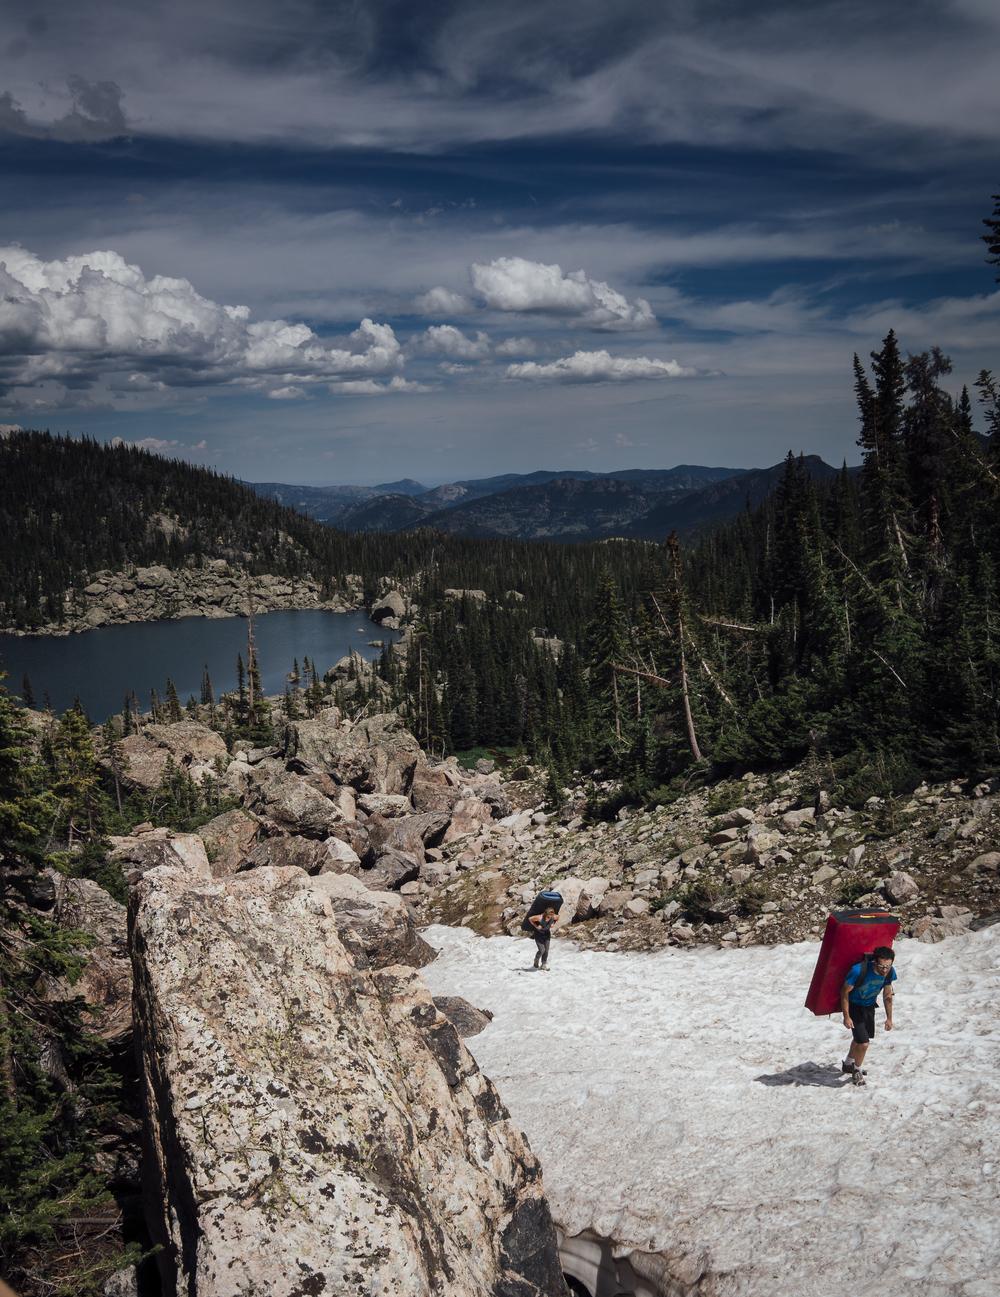 the-hike-to-upper-chaos-rmnp_14842383713_o.jpg